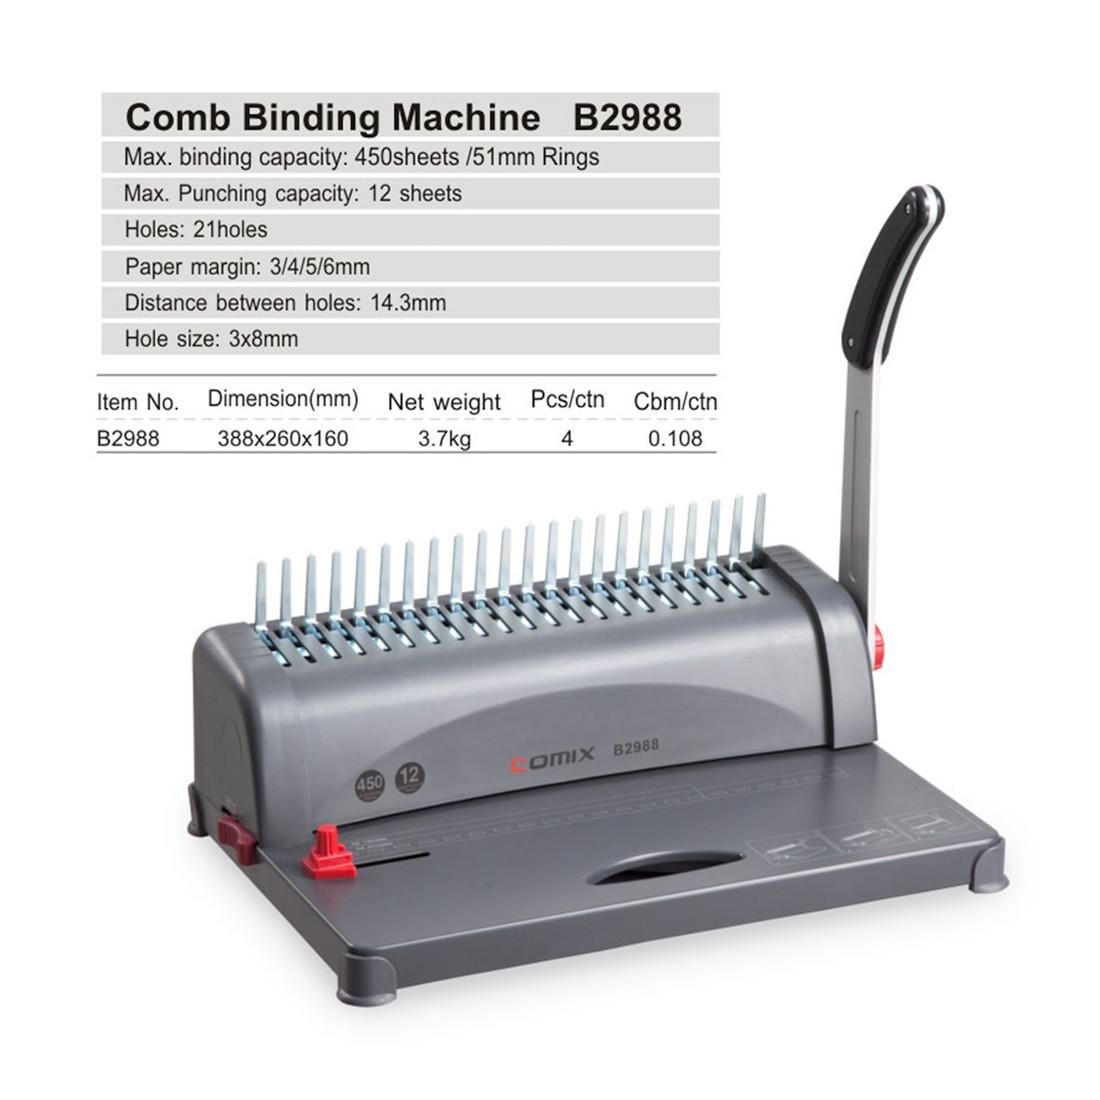 Переплётная машина на пластиковую пружину COMIX B2988, 450л./51мм.